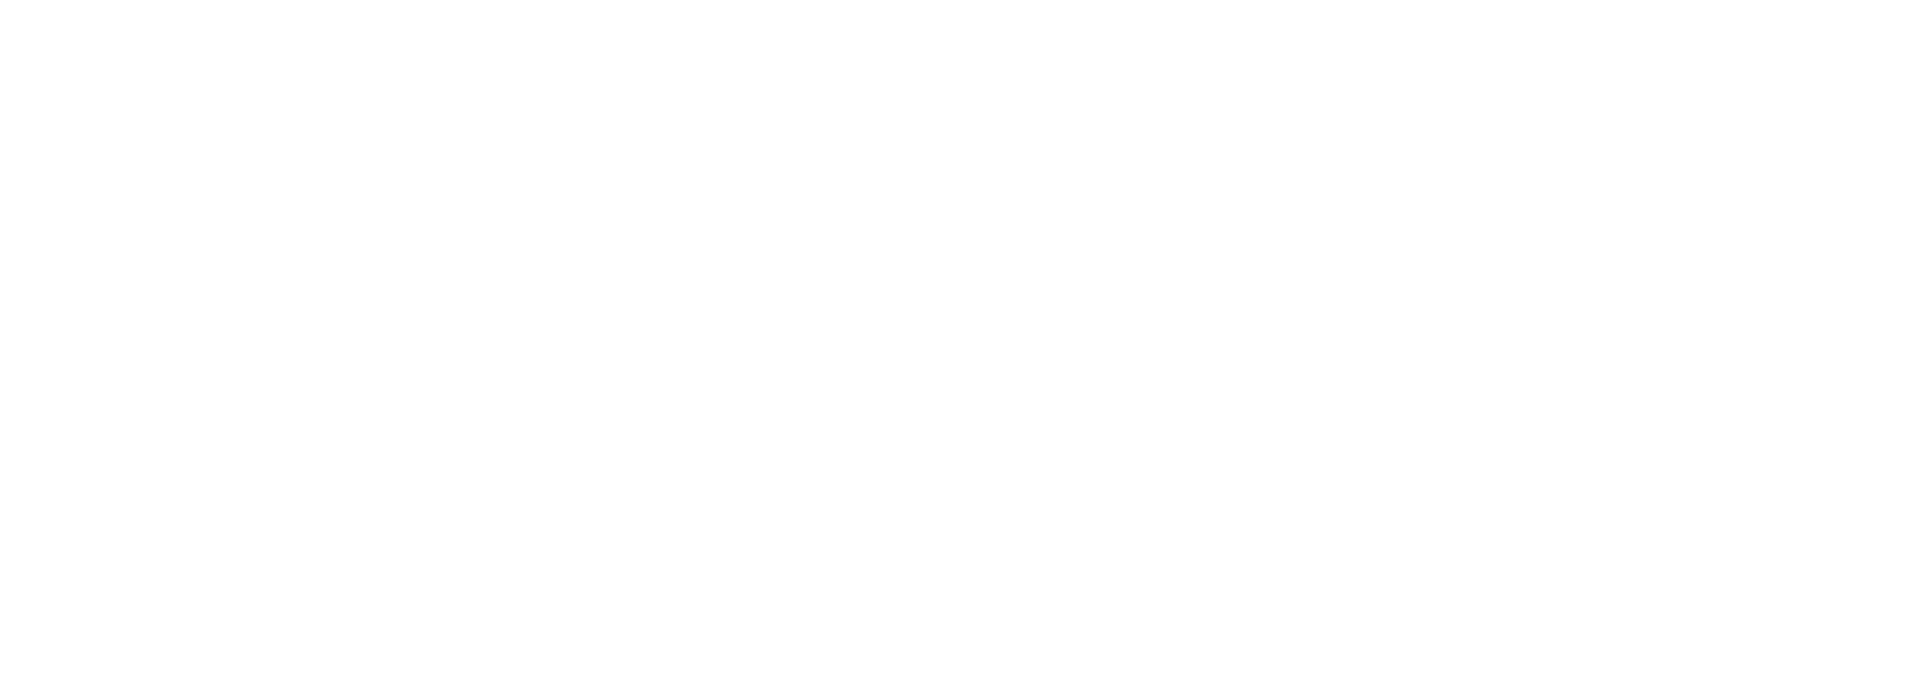 Risley Logo